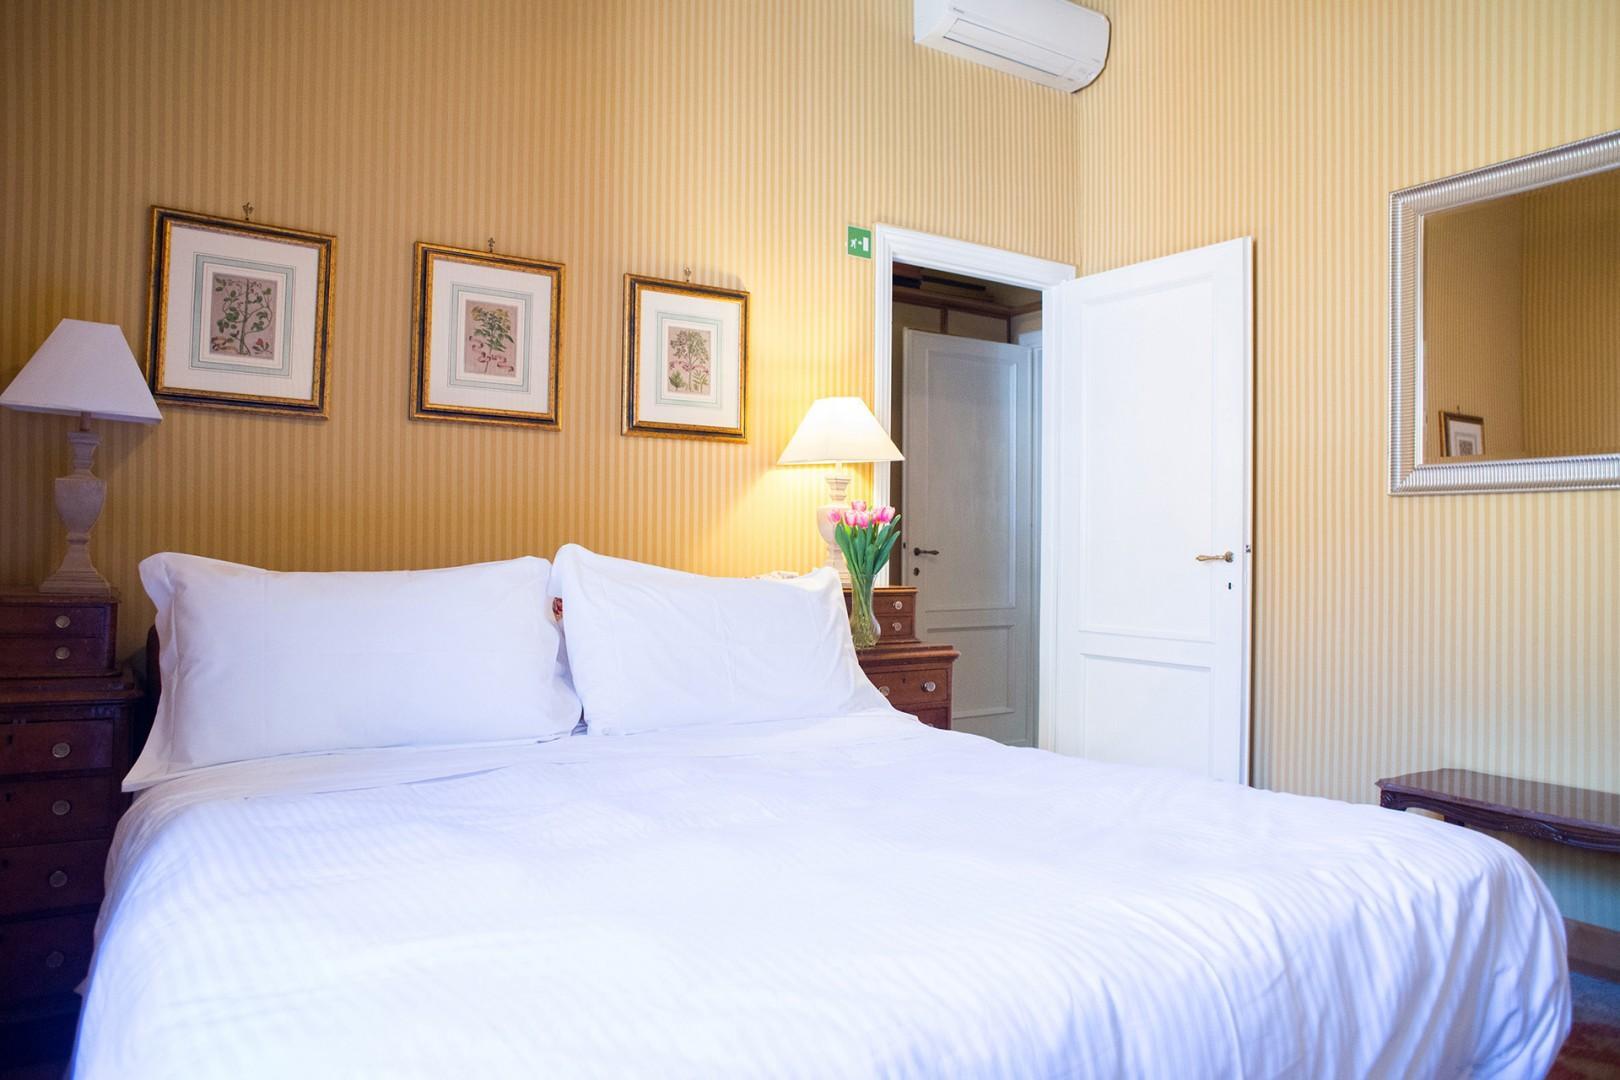 Nicely done bedroom 1 overlooks Piazza Pasquino.